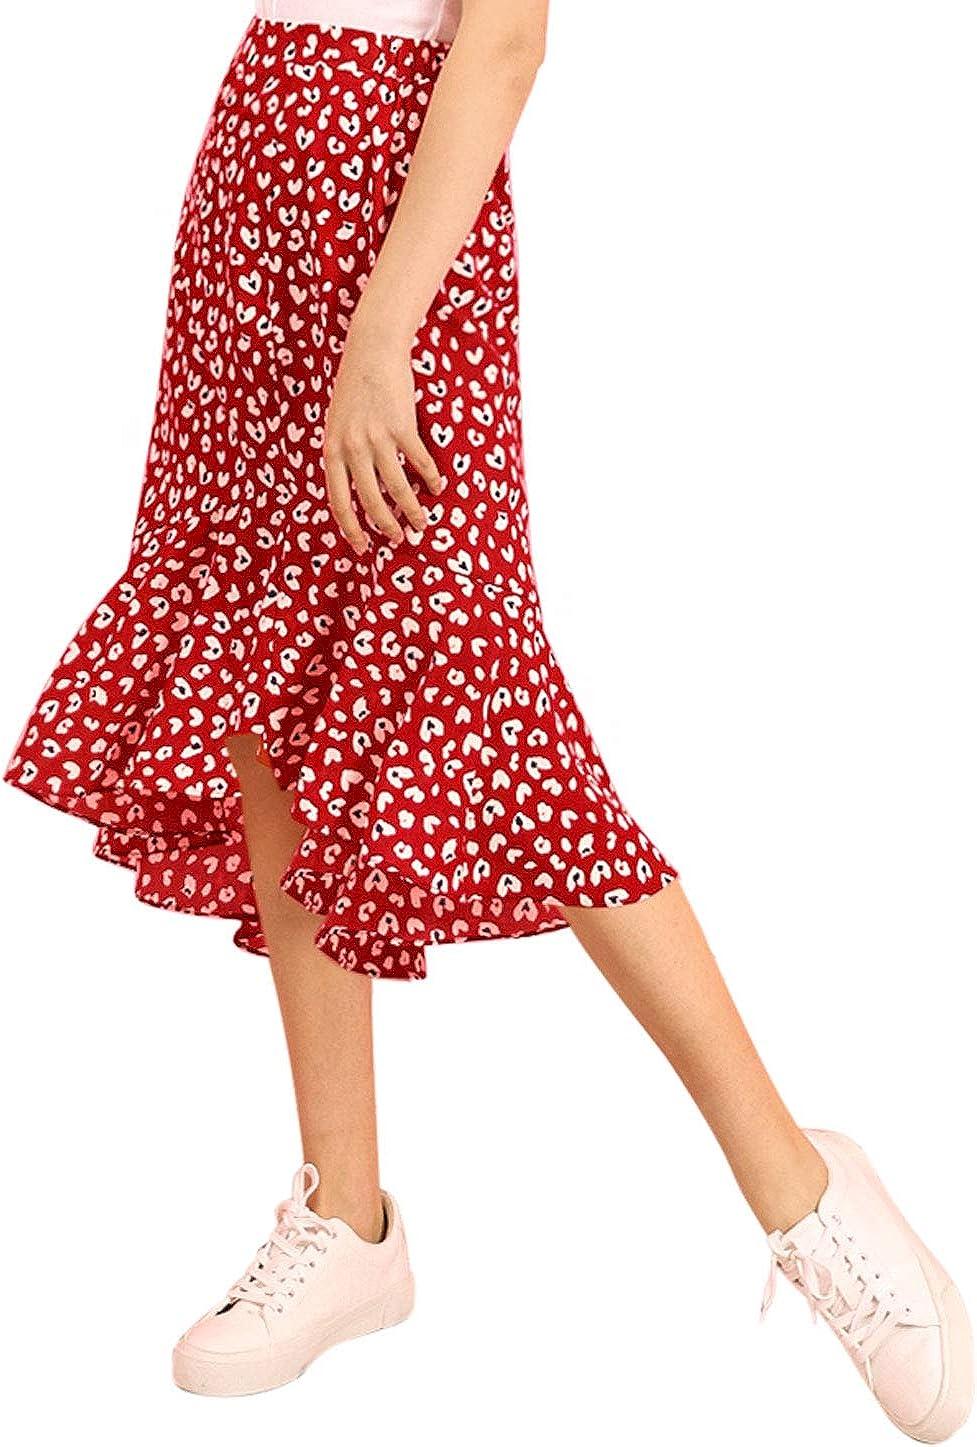 Allegra K Women's Leopard Floral Printed Ruffle Hem Mermaid Asymmetrical Midi Skirt